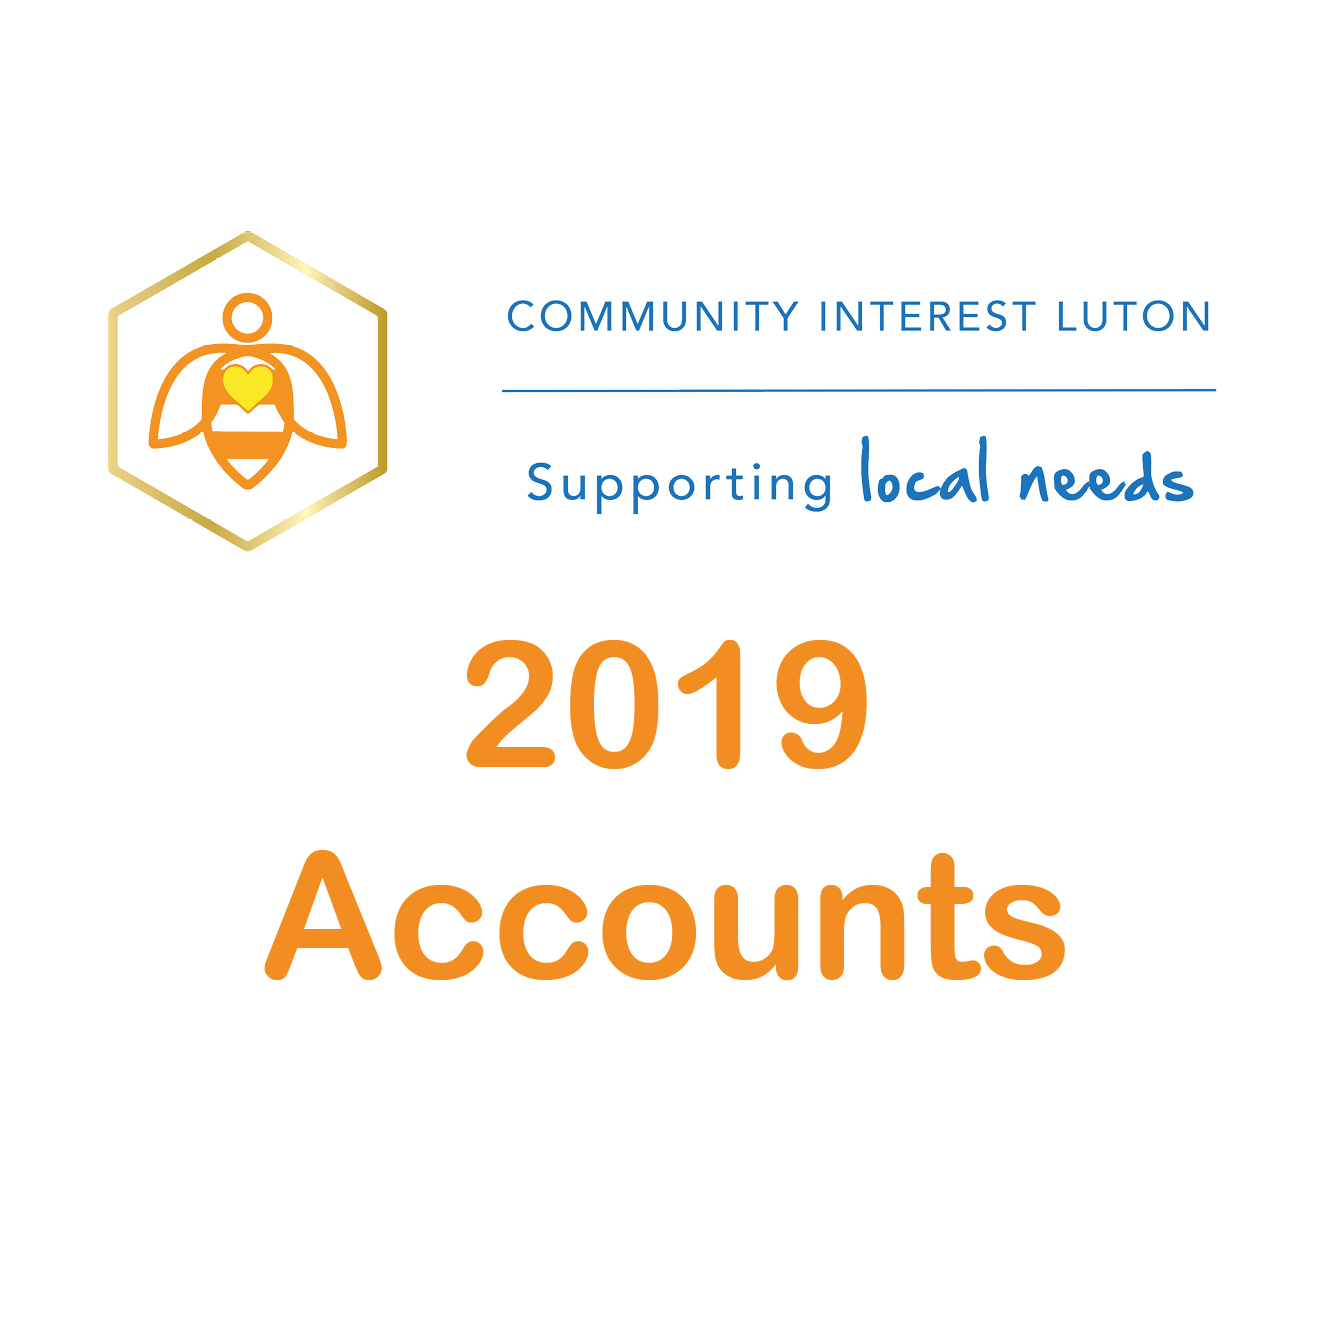 2019 Accounts